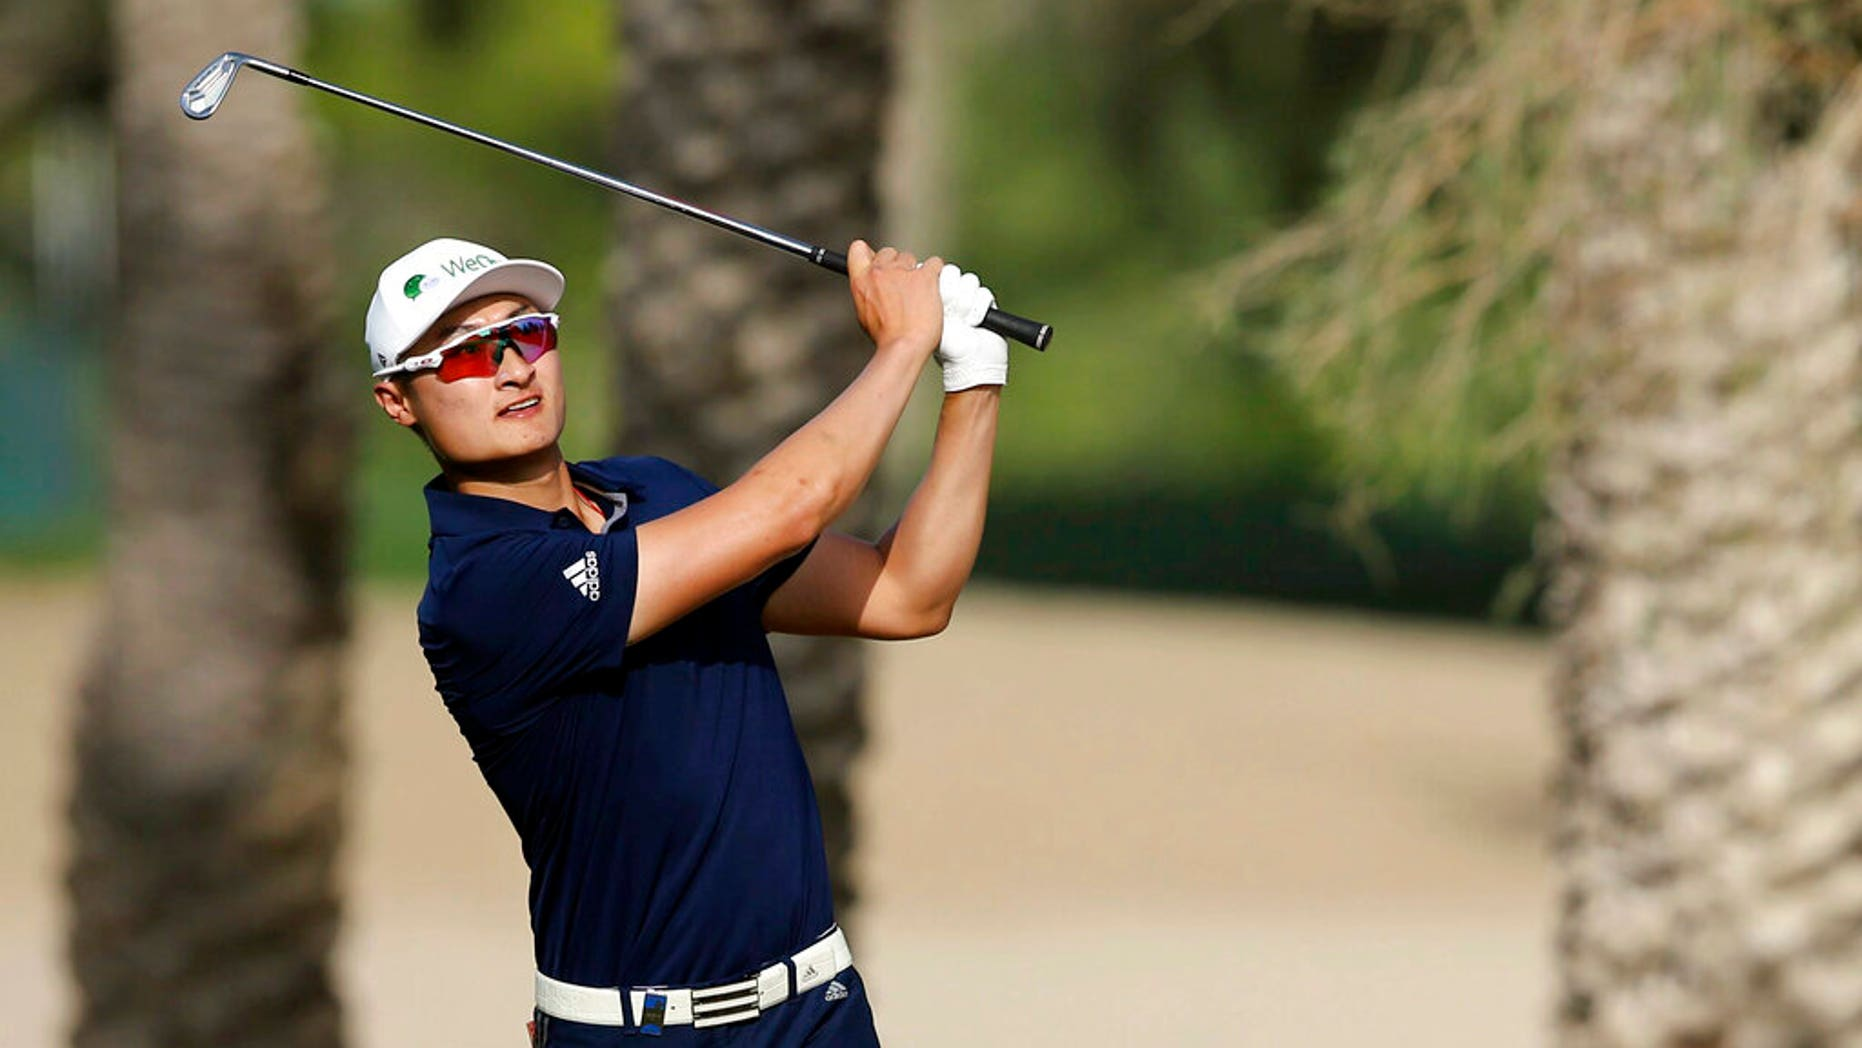 Haotong Li follows his ball on the 14th hole during the third round of the Dubai Desert Classic Golf Tournament in Dubai, United Arab Emirates.